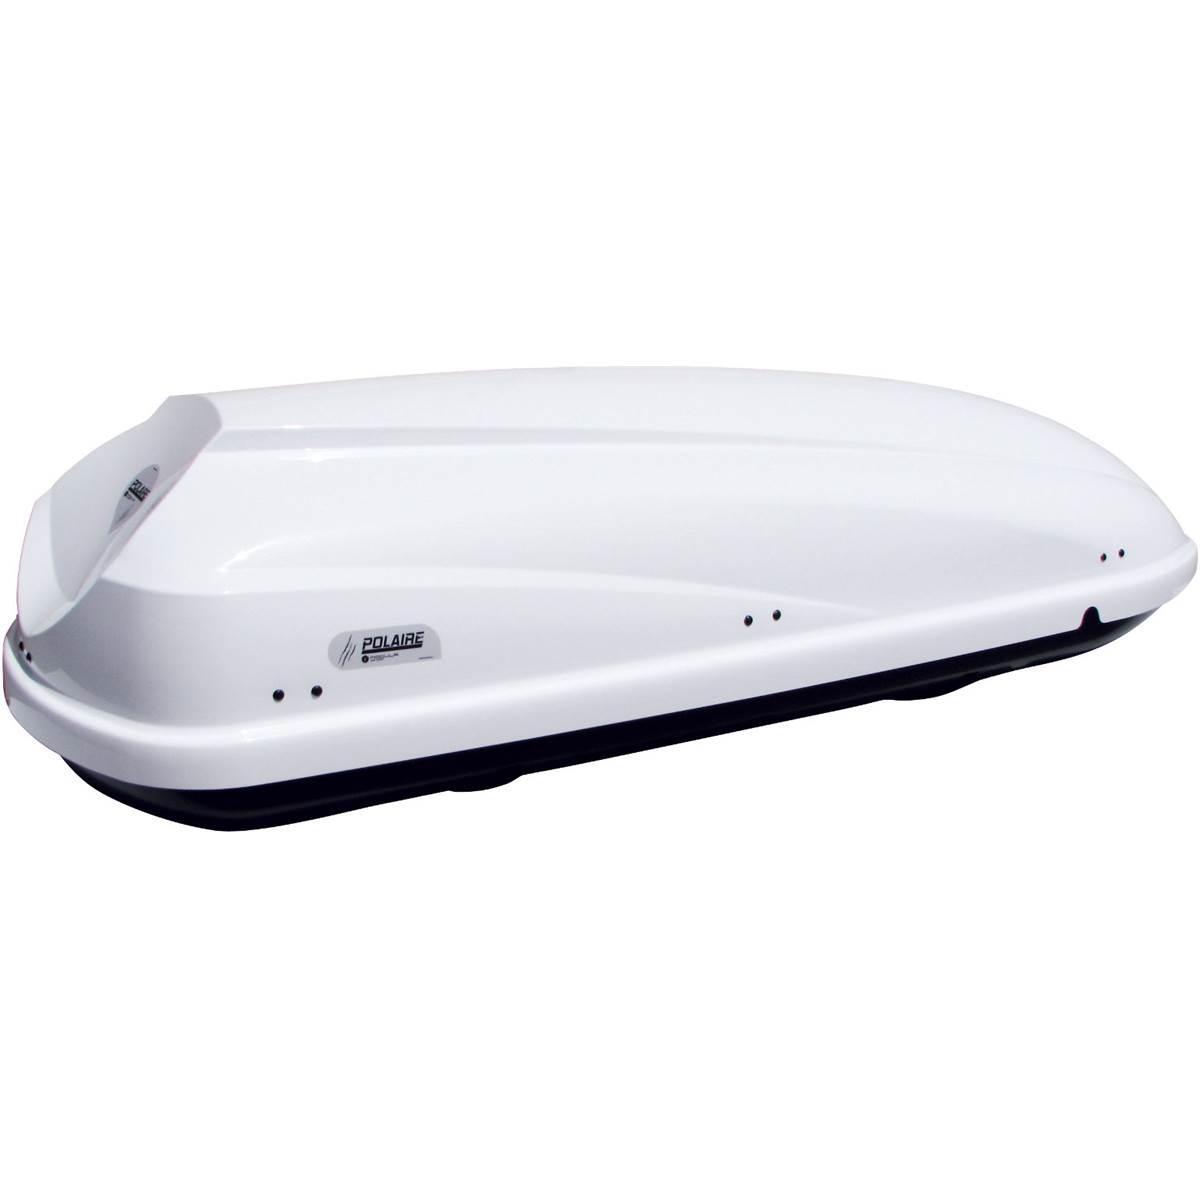 Coffre de toit mixte Travel blanc 460